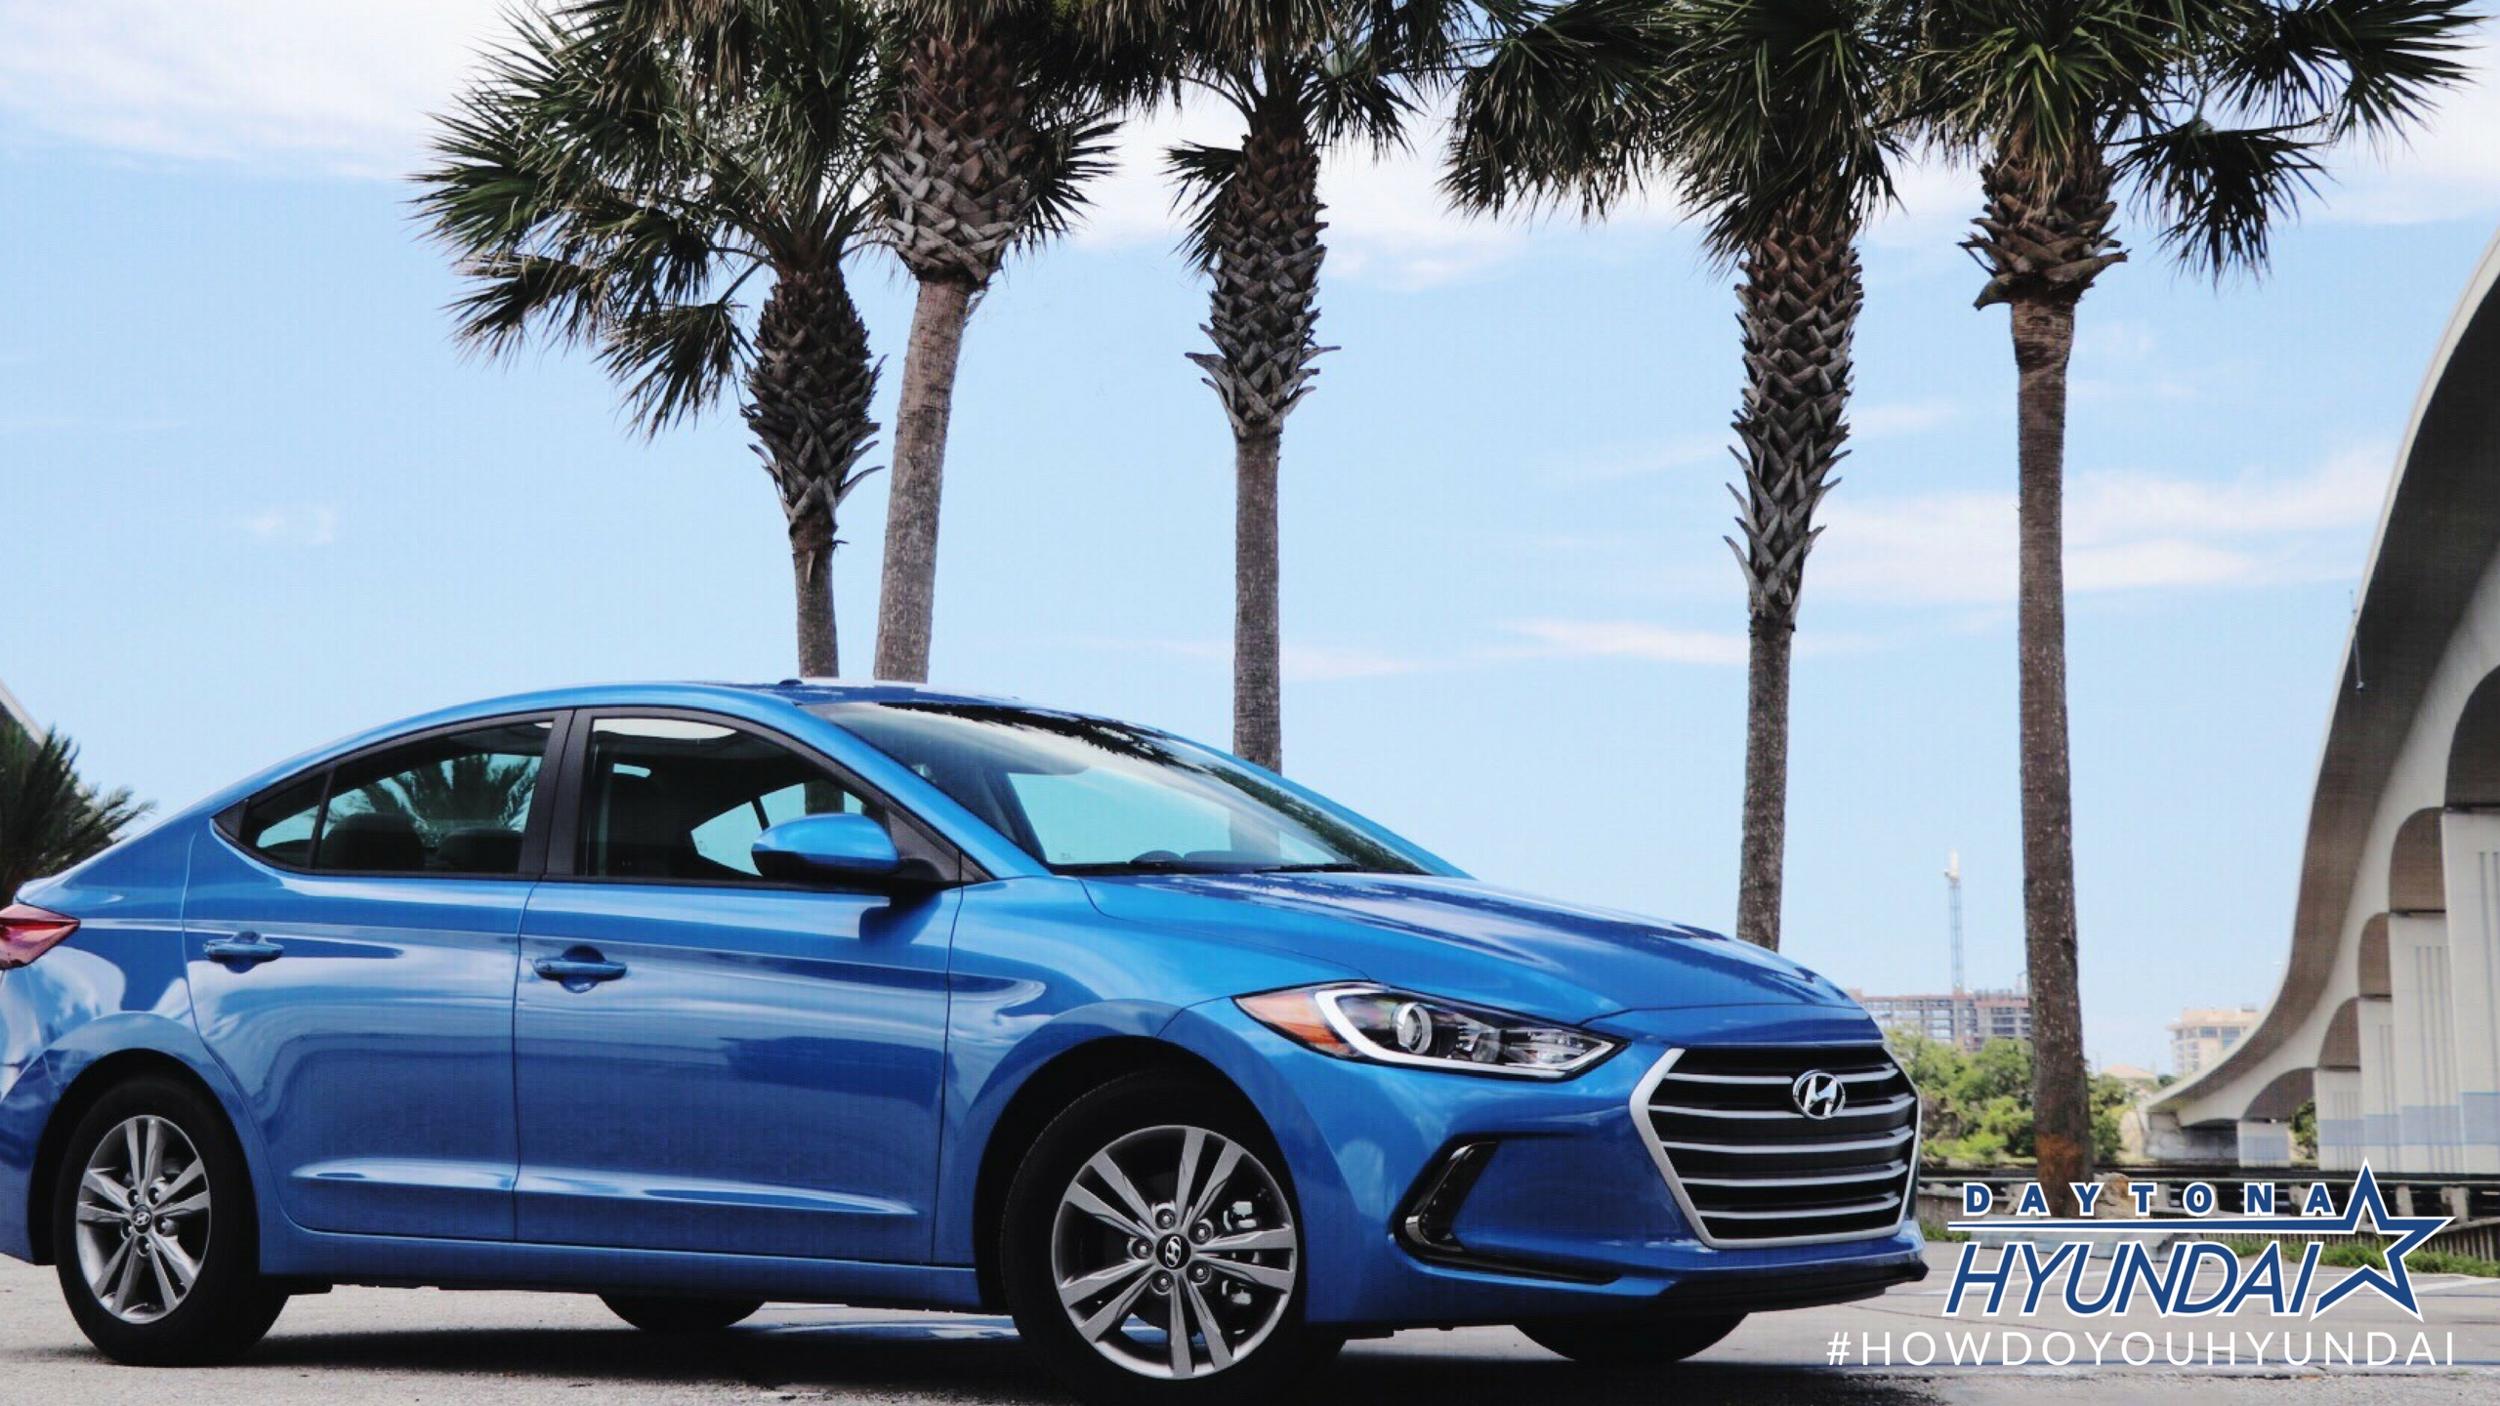 Daytona Hyundai - Social Media Marketing | Photography | Videography